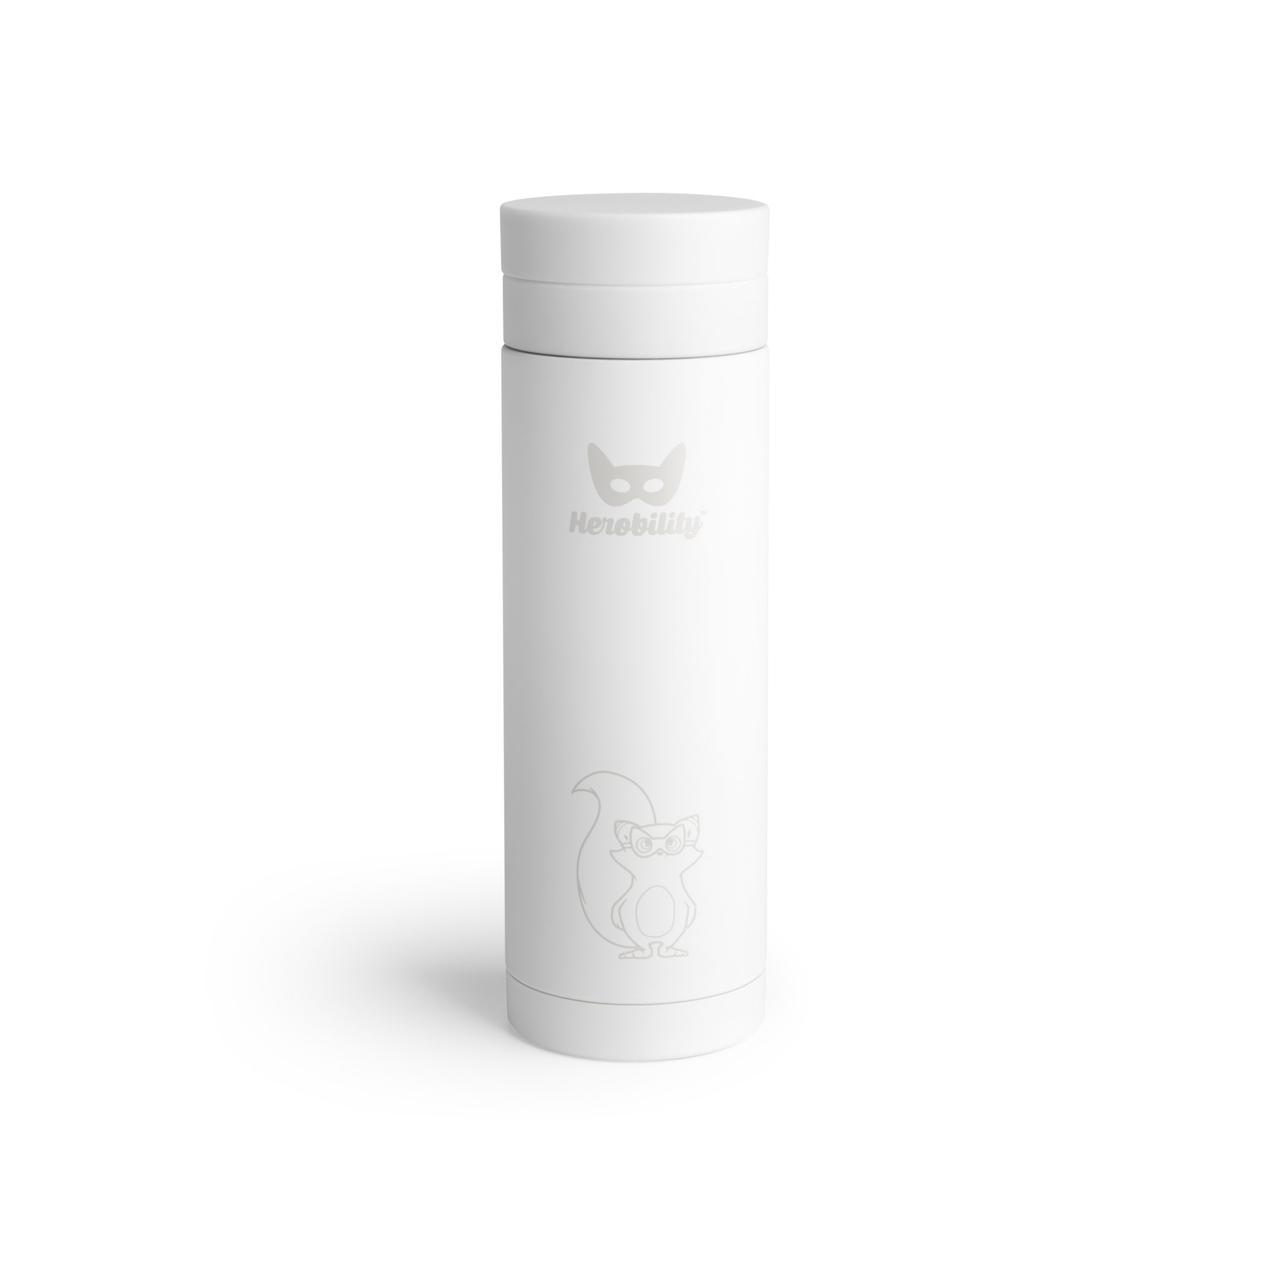 Herobility - Термос HeroTermos 300 мл, цвет белый